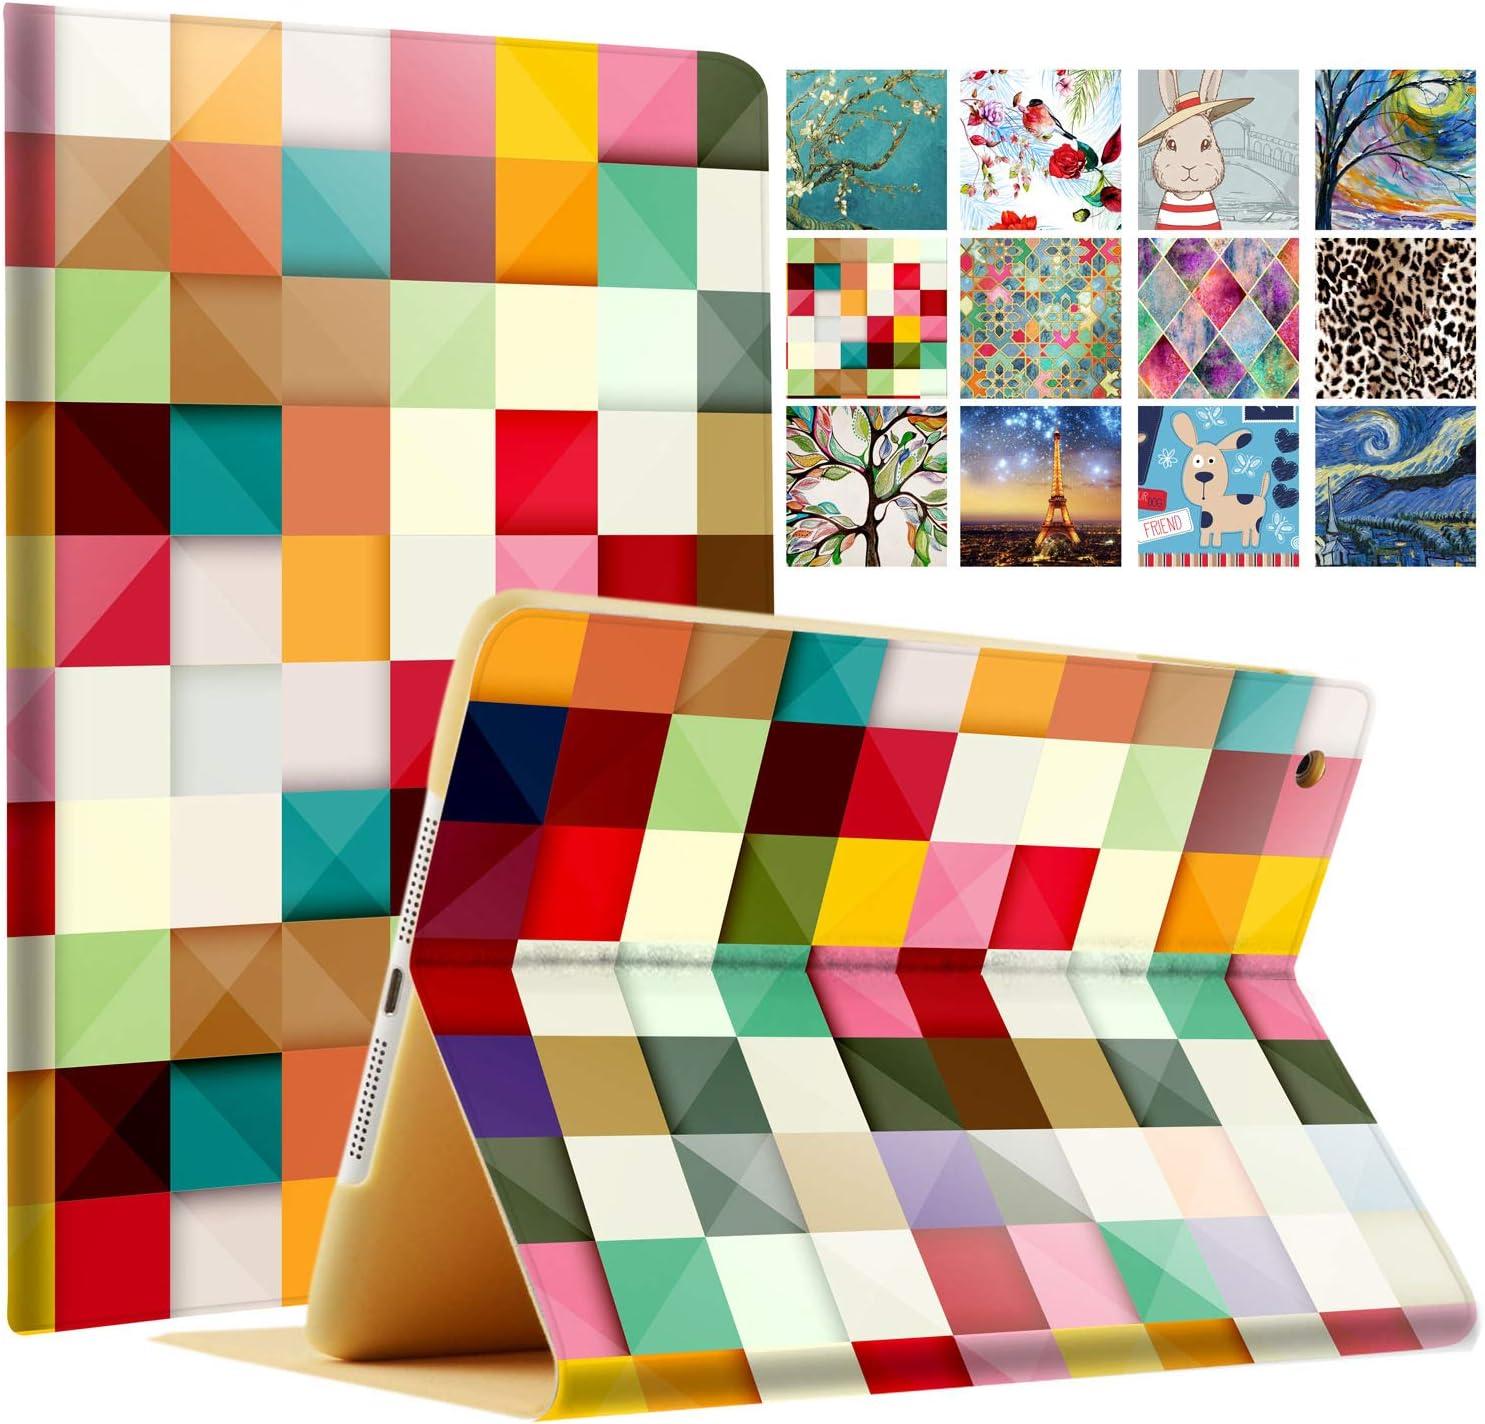 DuraSafe Case for iPad Mini 3 / Mini 2 / Mini 1-7.9 Inch [ A1432 A1454 A1455 A1489 A1490 A1491 A1599 A1600 ] Printed Smart Cover Slim Folio - Color Grid